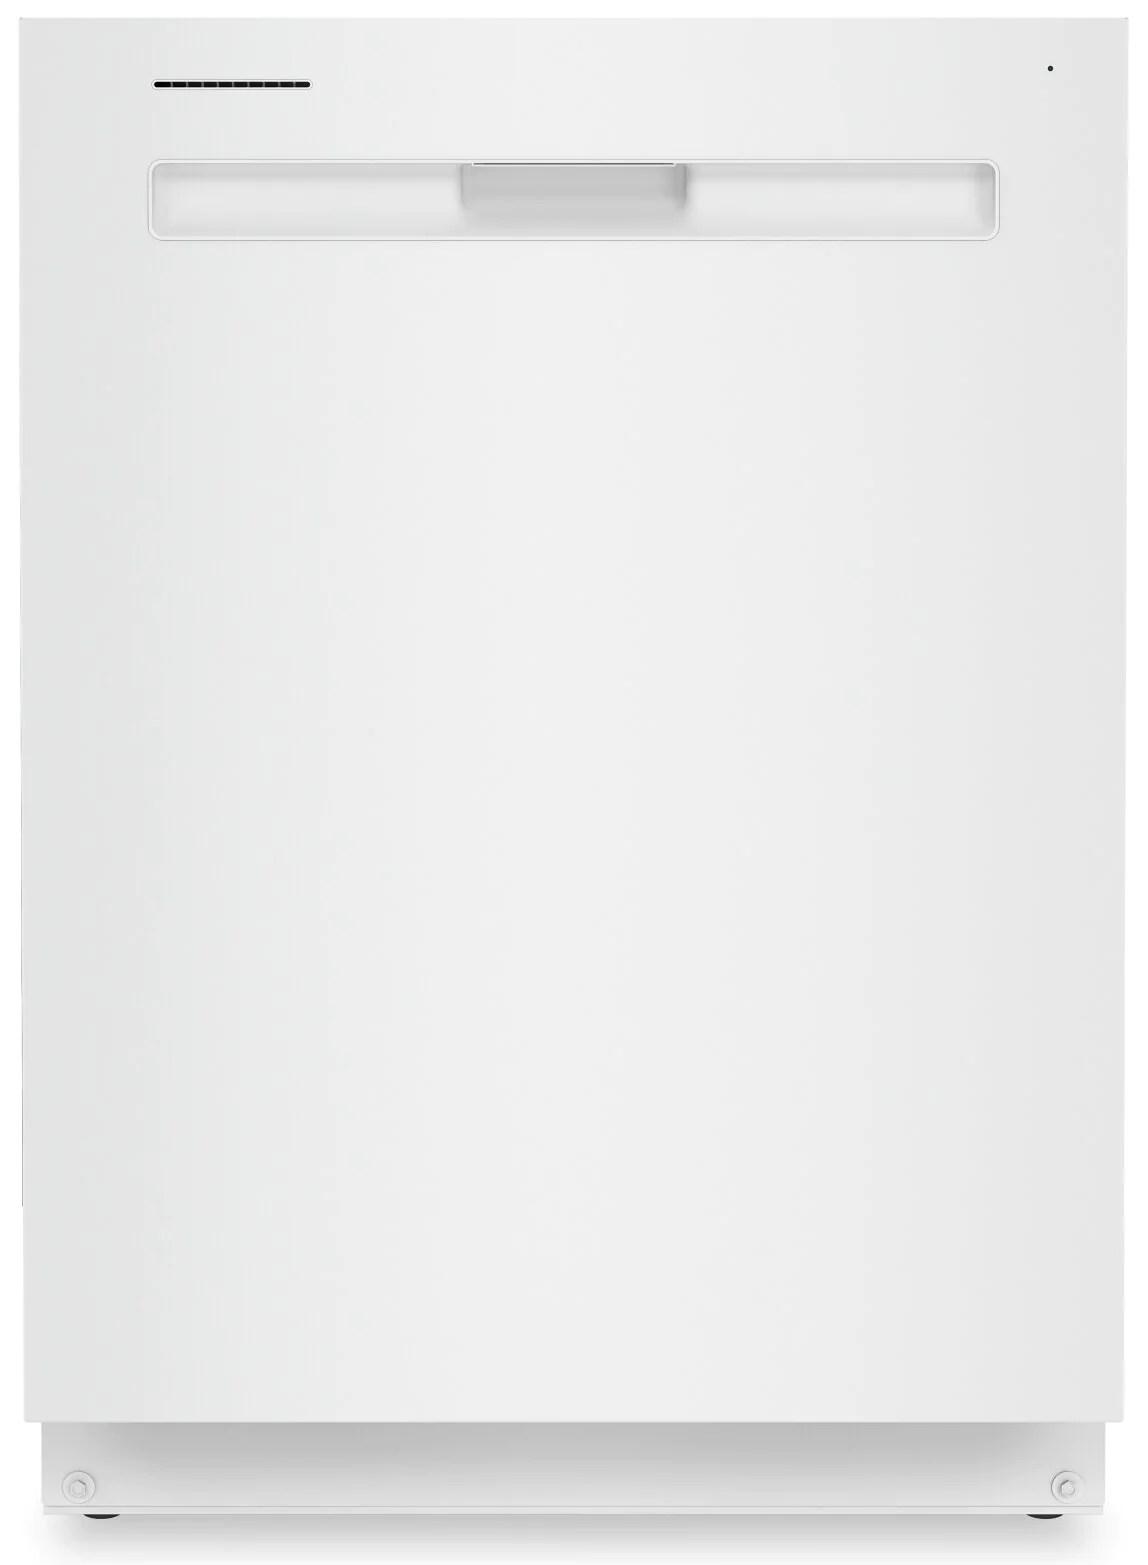 maytag top control dishwasher with third rack mdb8959skw